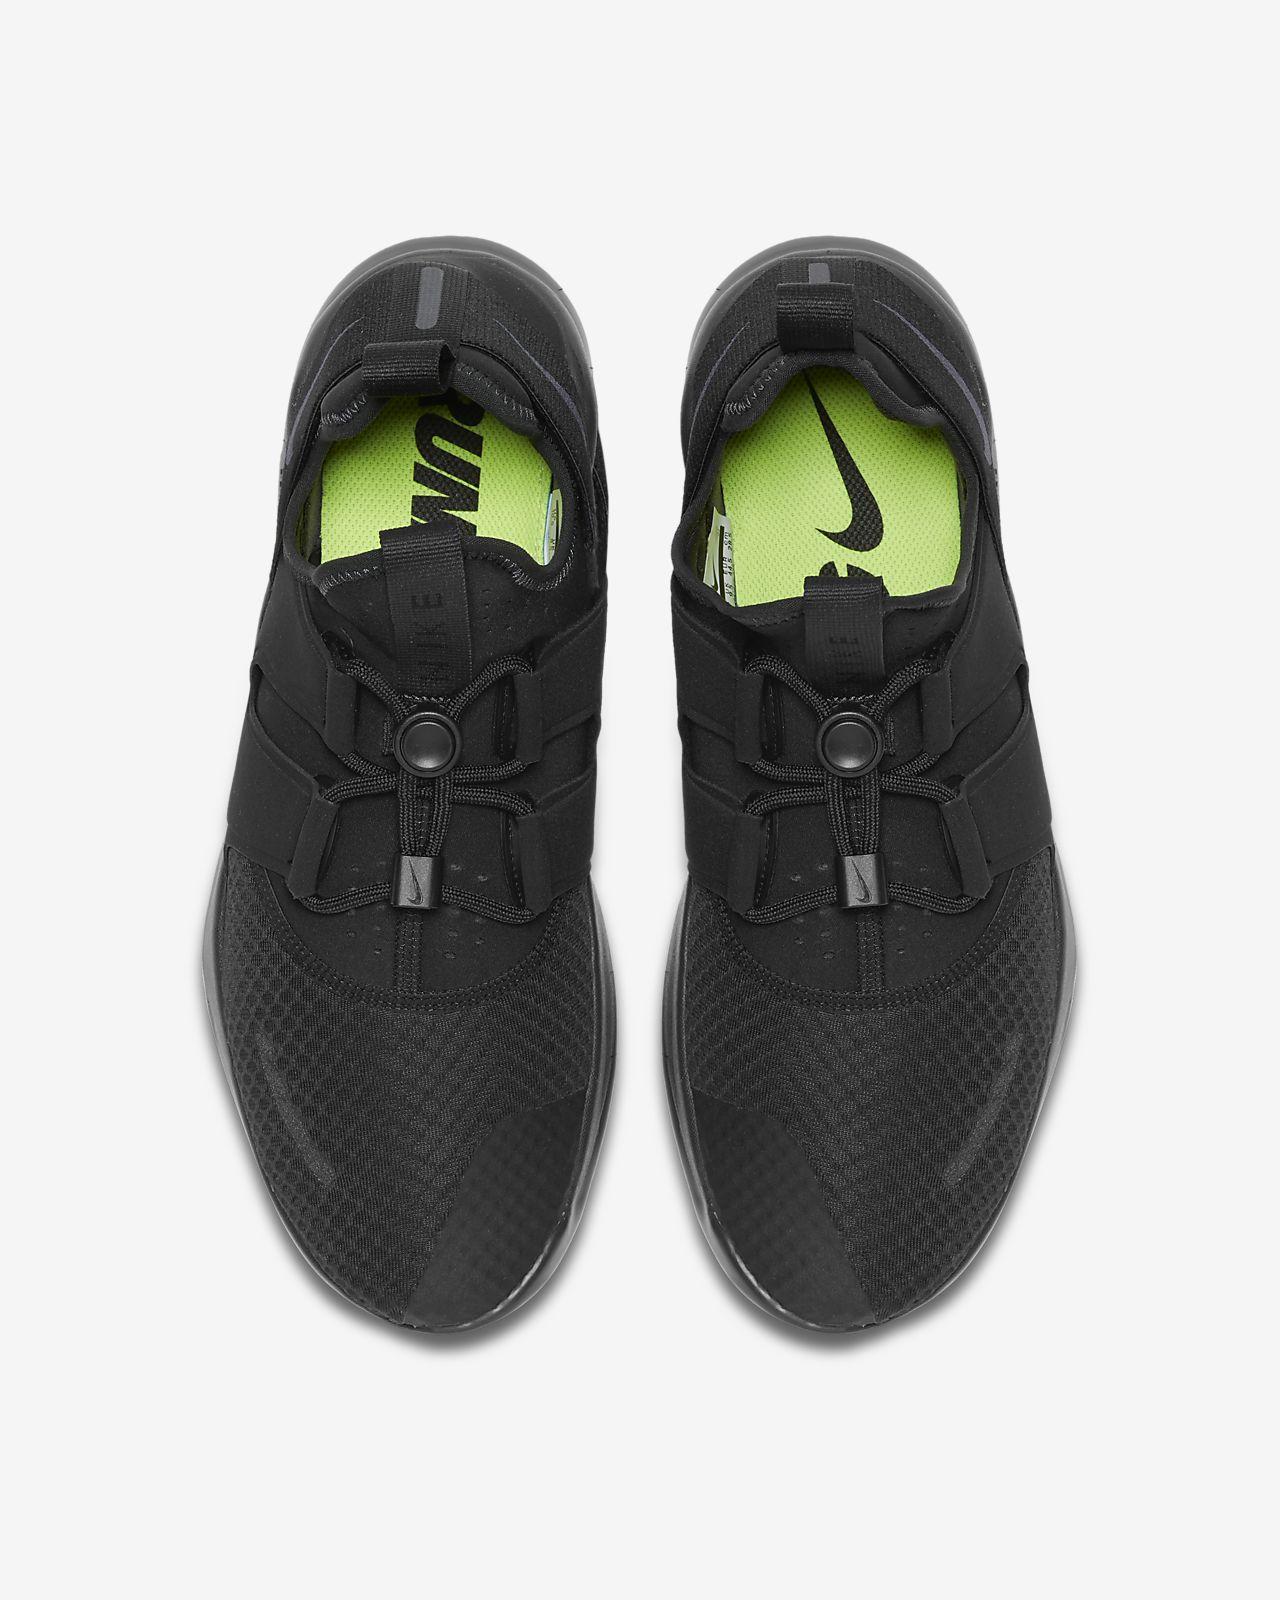 4c78d0b04a0f Nike Free RN Commuter 2018 Men s Running Shoe. Nike.com